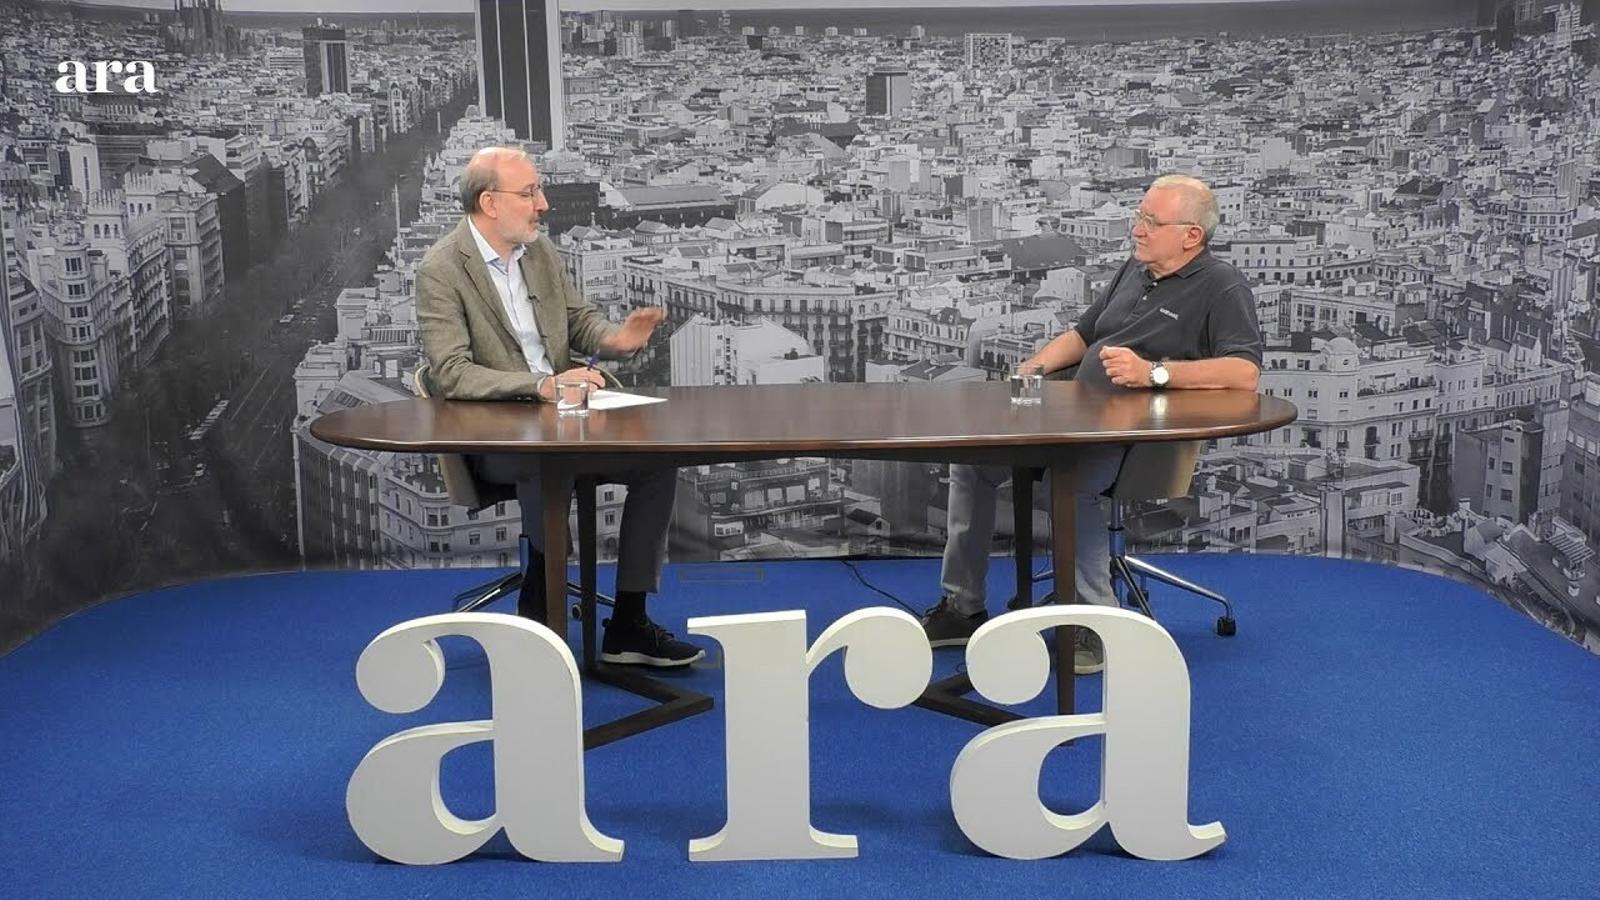 Entrevista d'Antoni Bassas al doctor Josep Maria Via